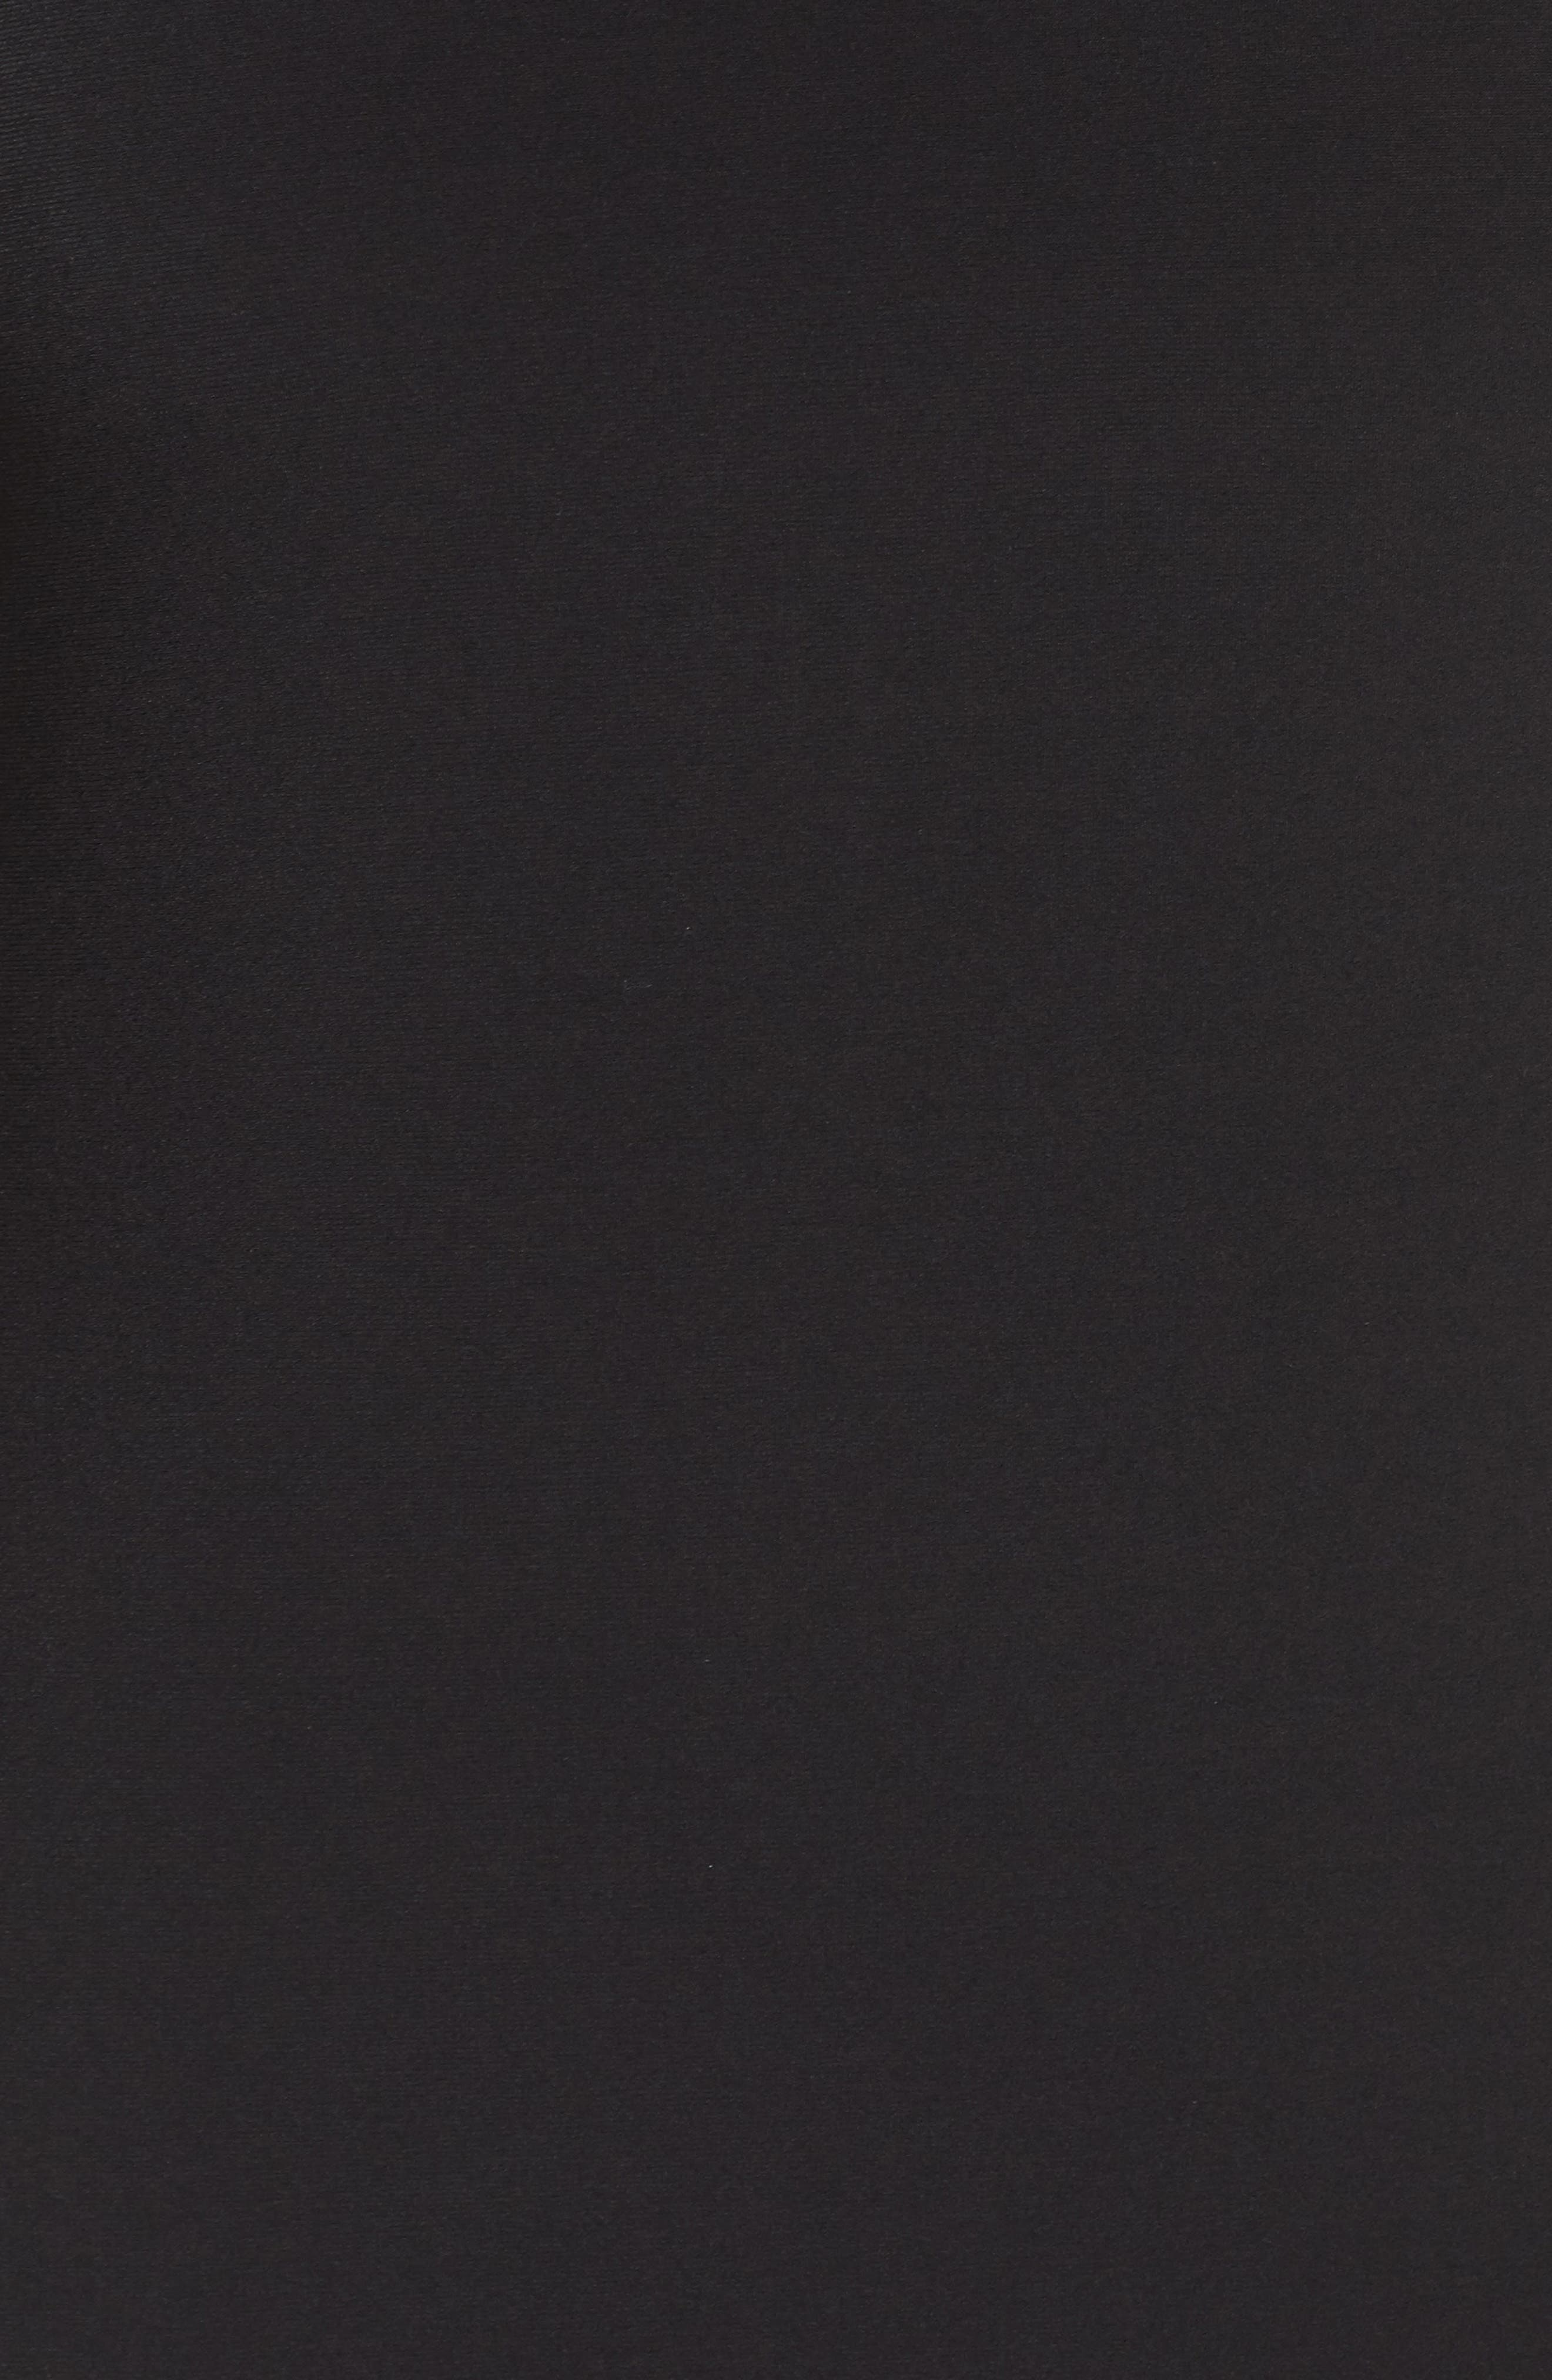 Pleat Chiffon Hem Jersey Dress,                             Alternate thumbnail 6, color,                             BLACK